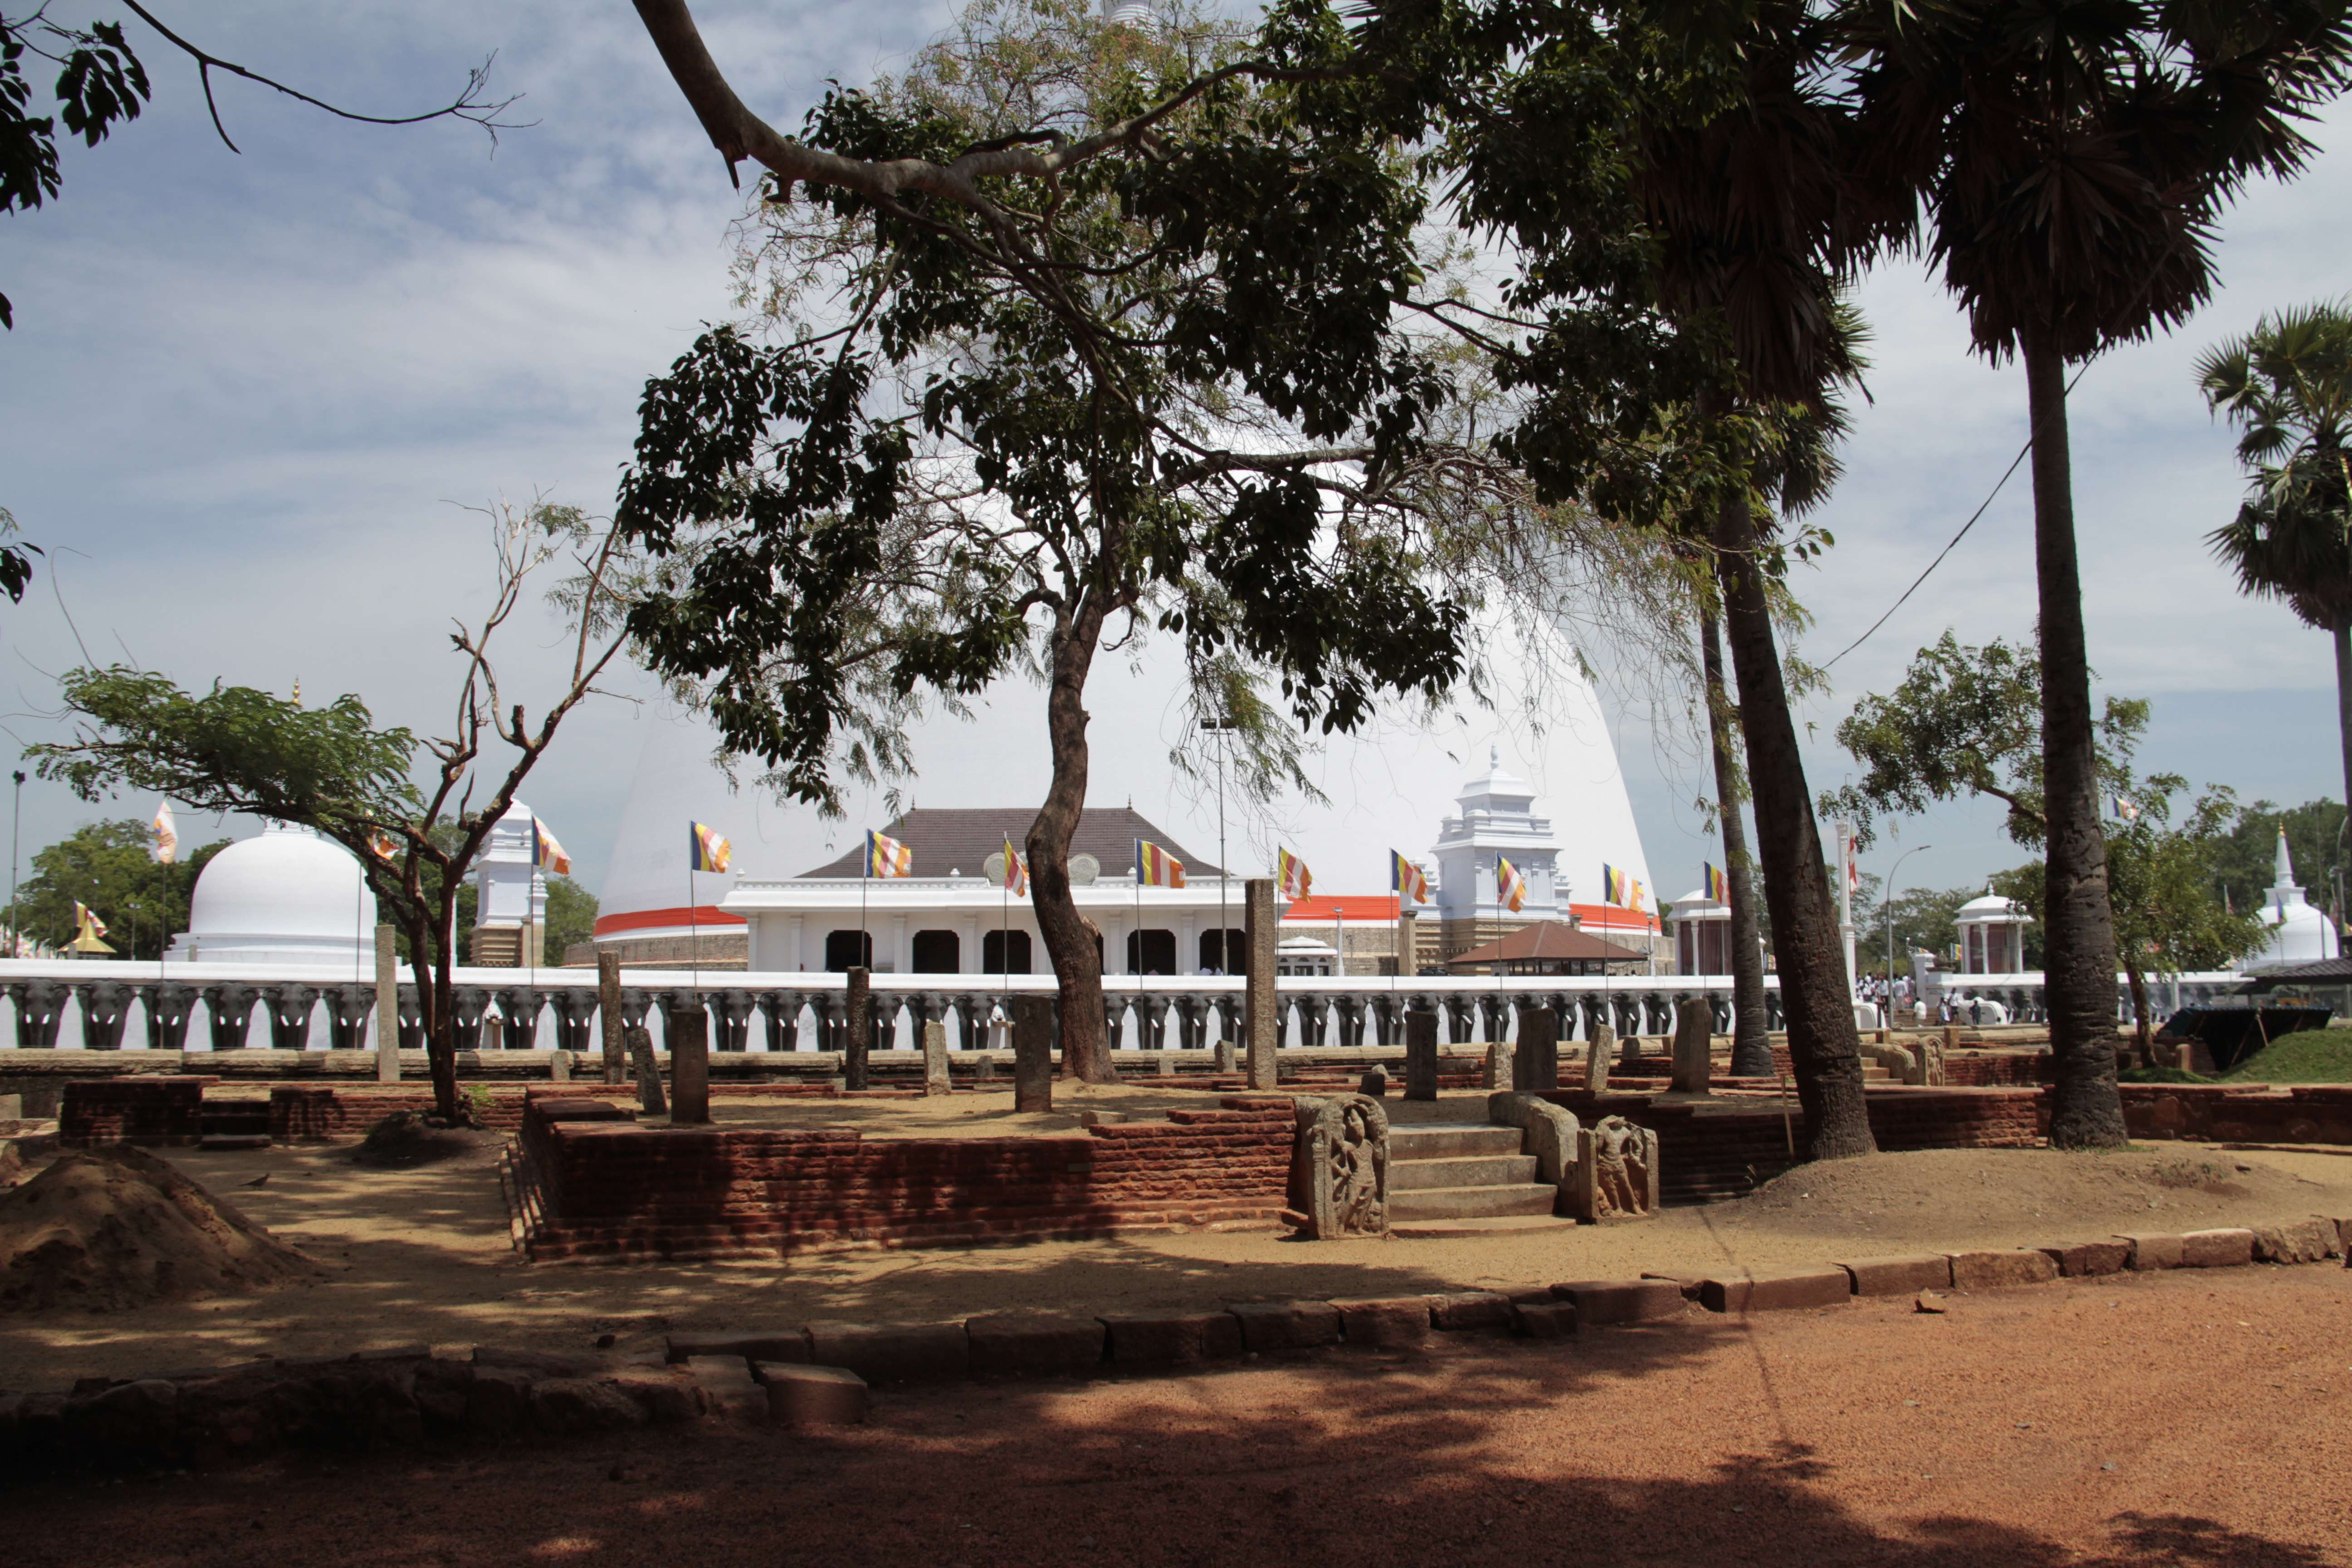 Sri Lanka aout 2017_0315 Anuradhapura Dagoba Ruvanvelisaya